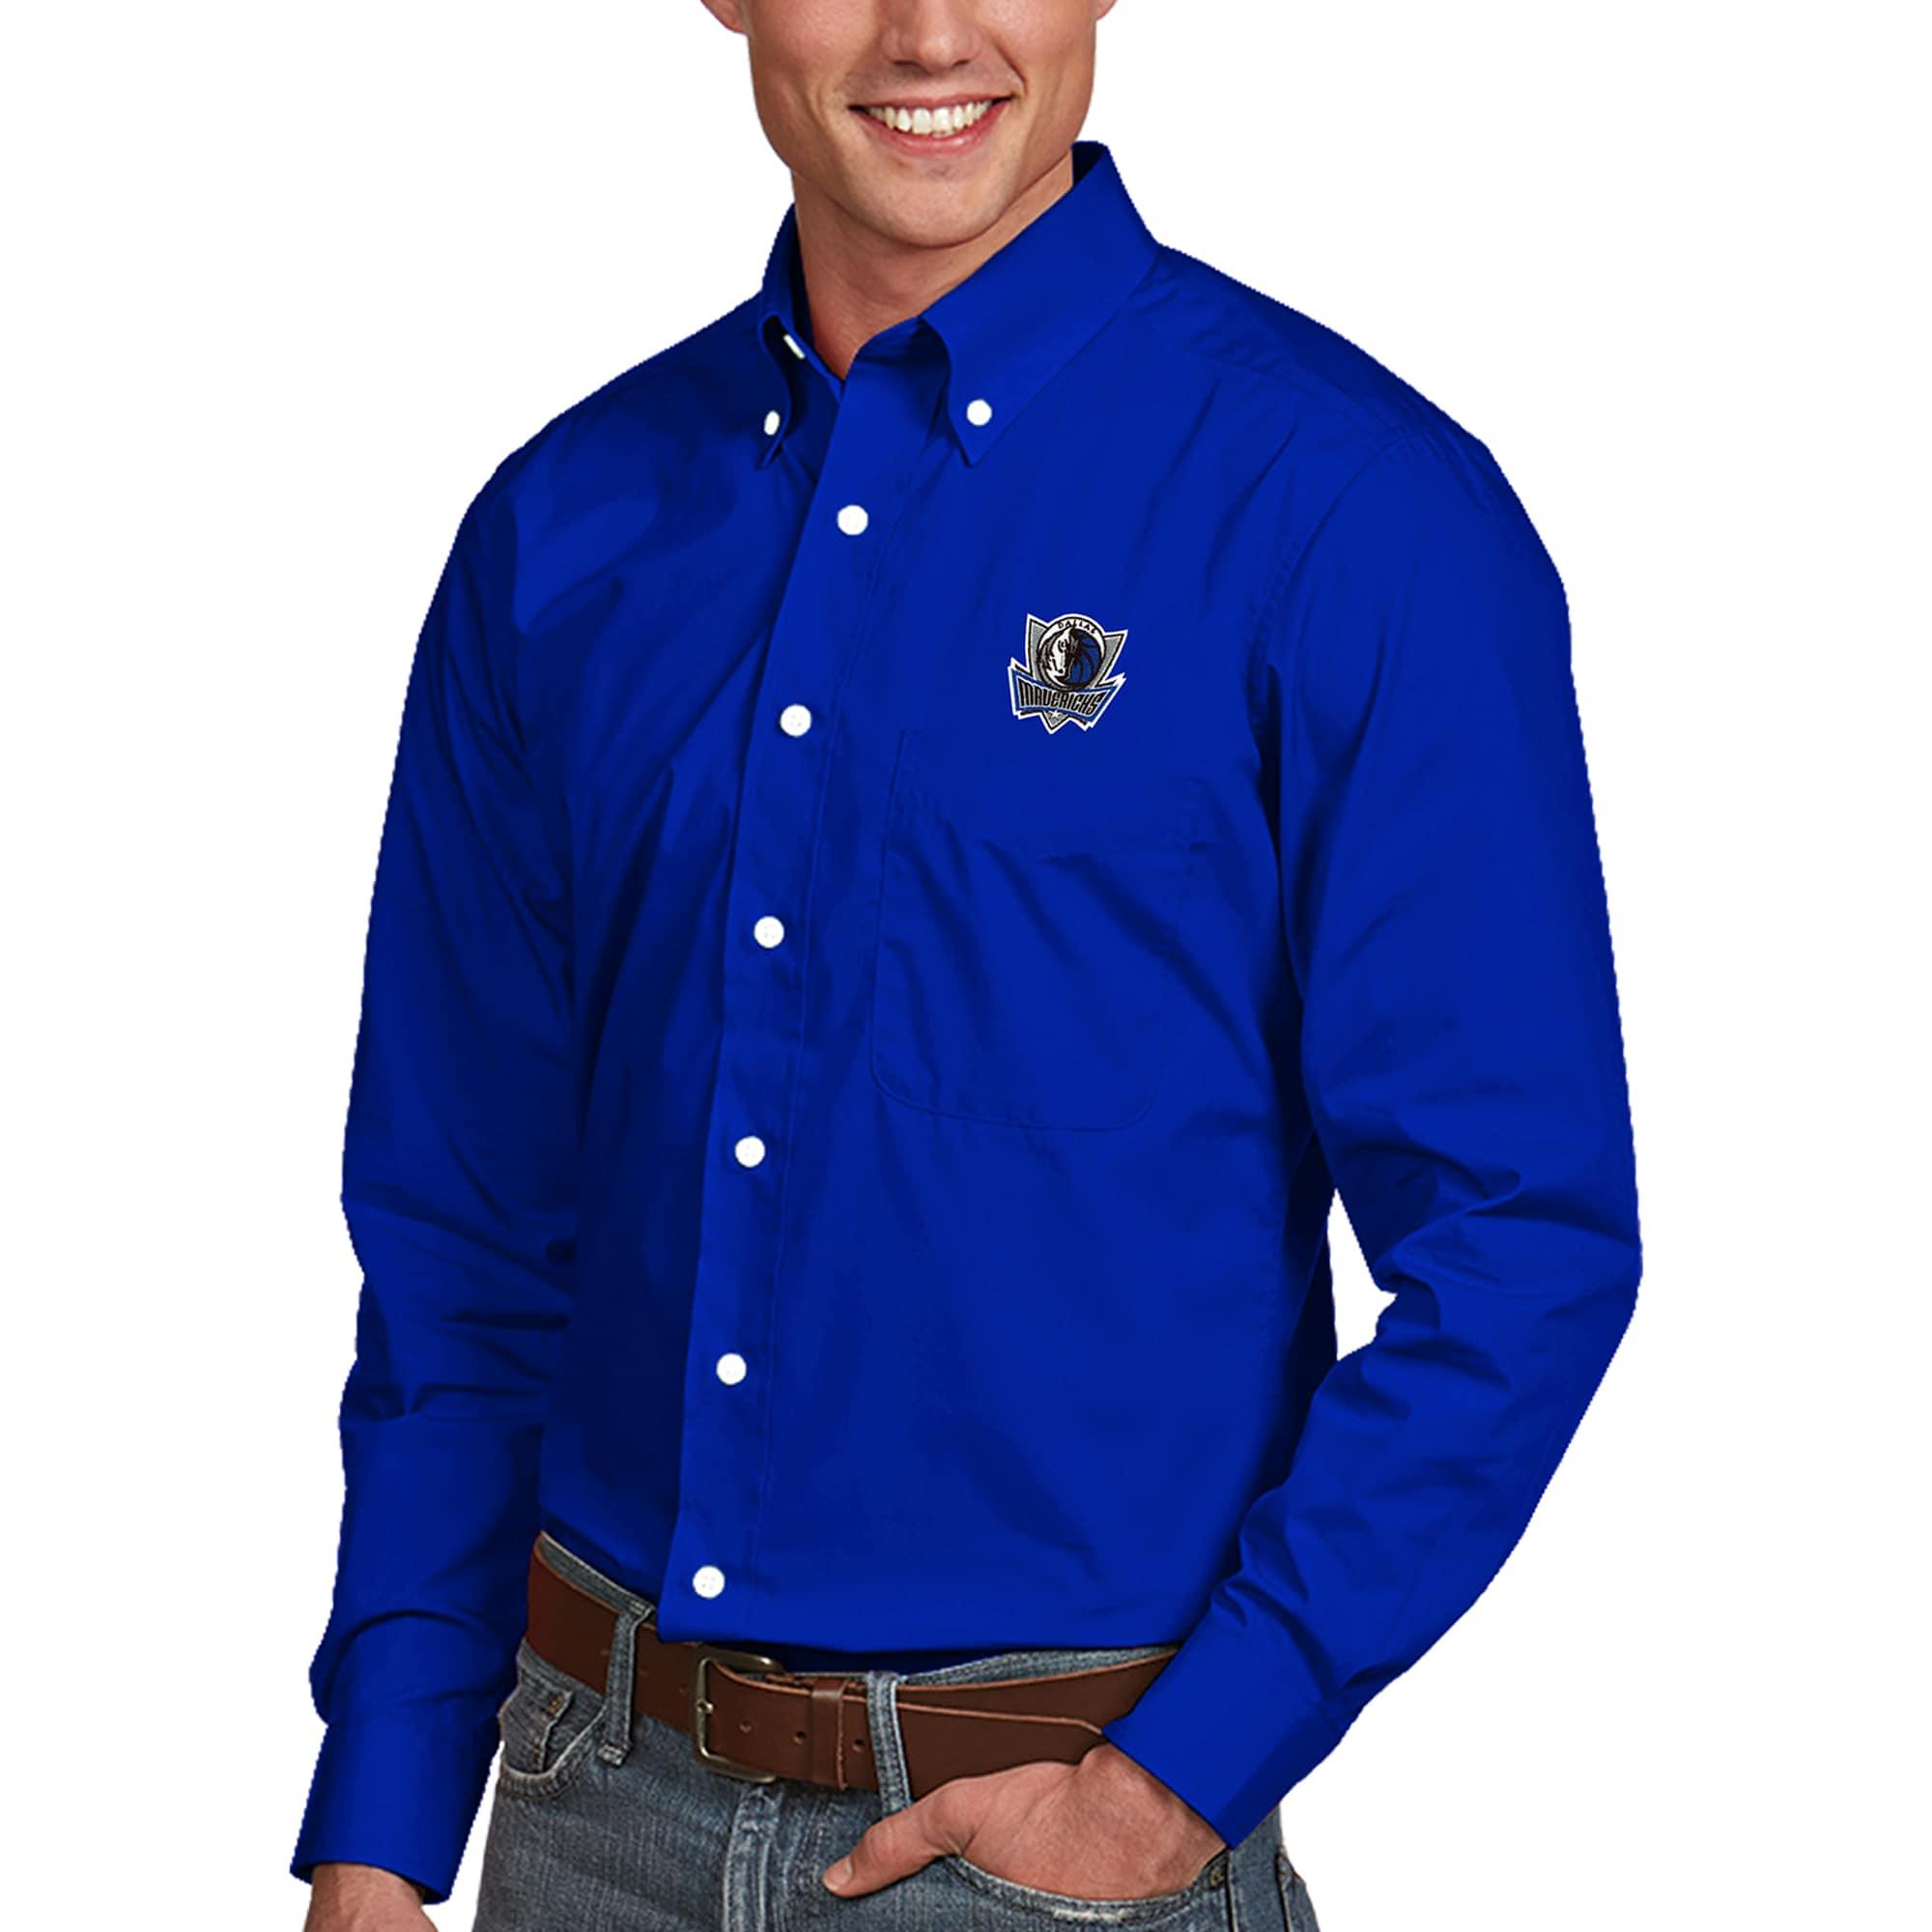 Dallas Mavericks Antigua Dynasty Button-Down Long Sleeve Shirt - Royal